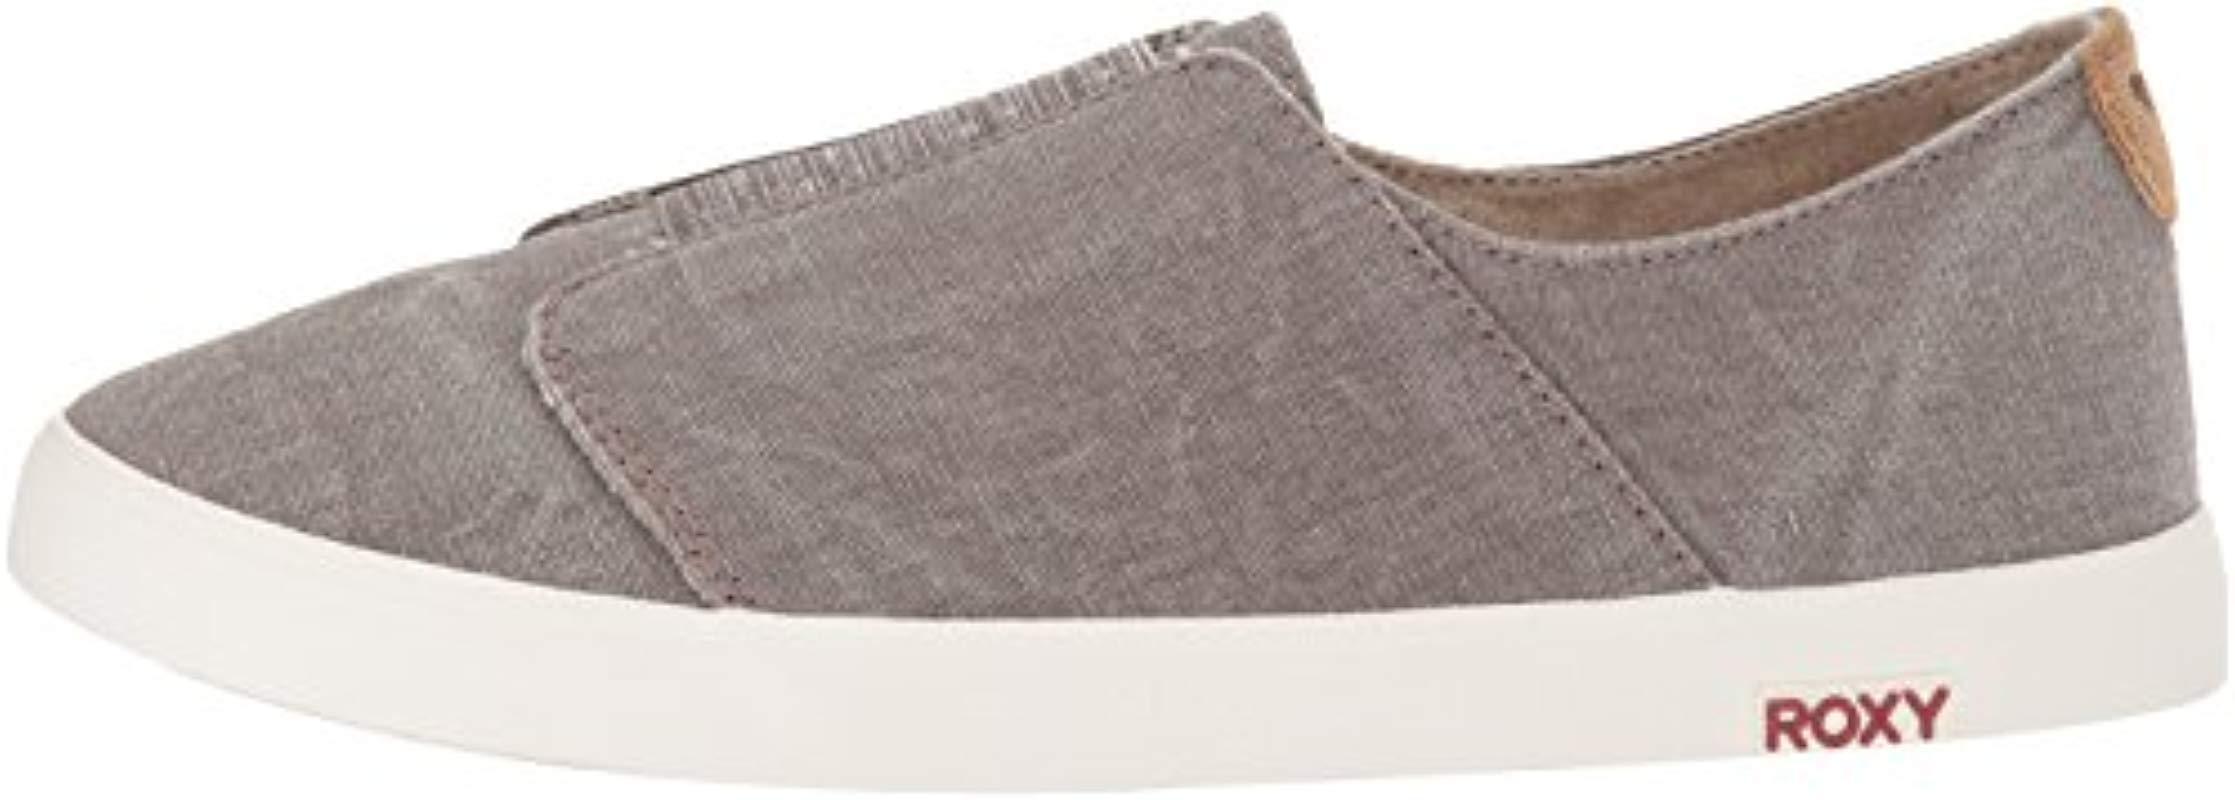 Roxy Linen Rocco Slip On Sneaker in Taupe (Grey)